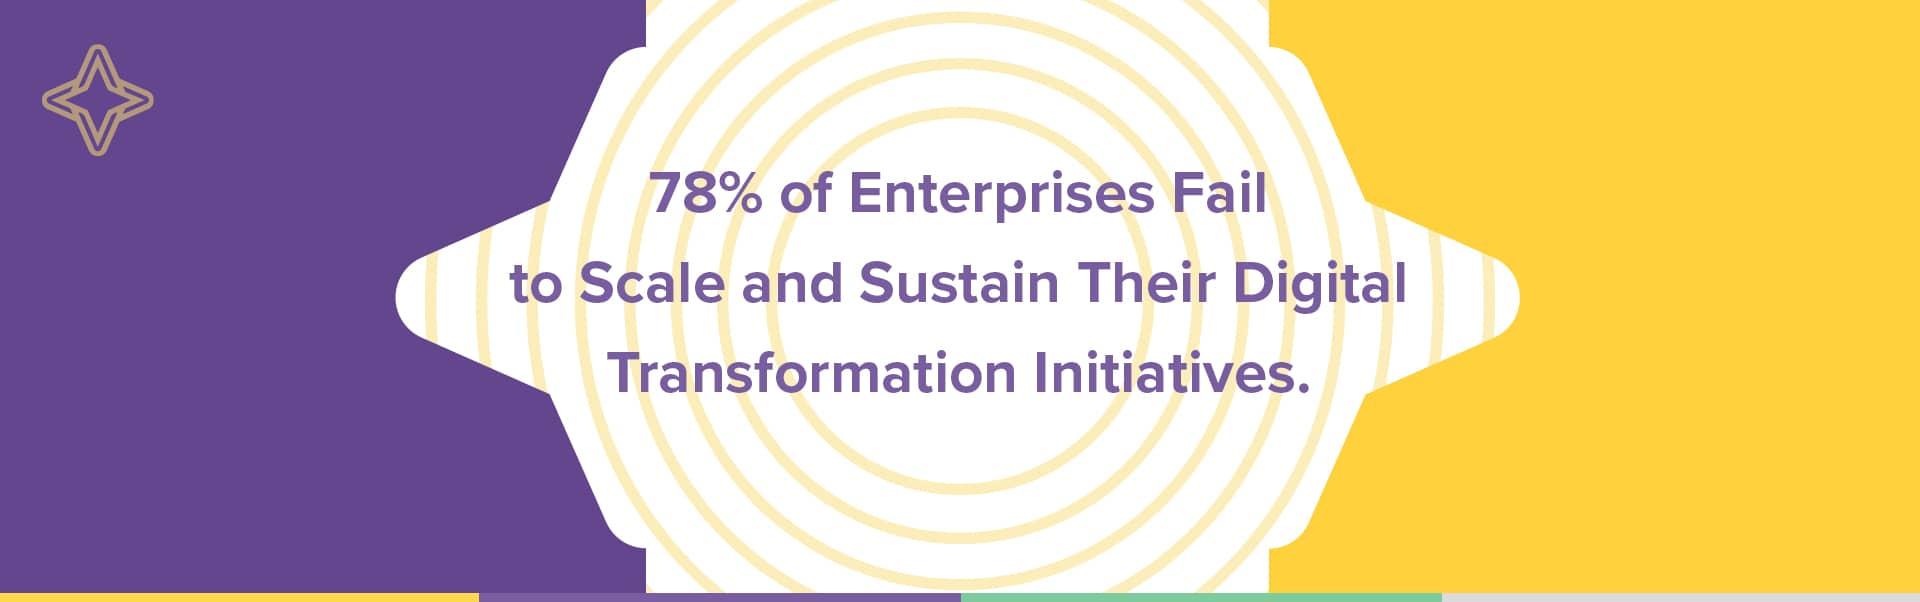 digital transformation definition initiatives